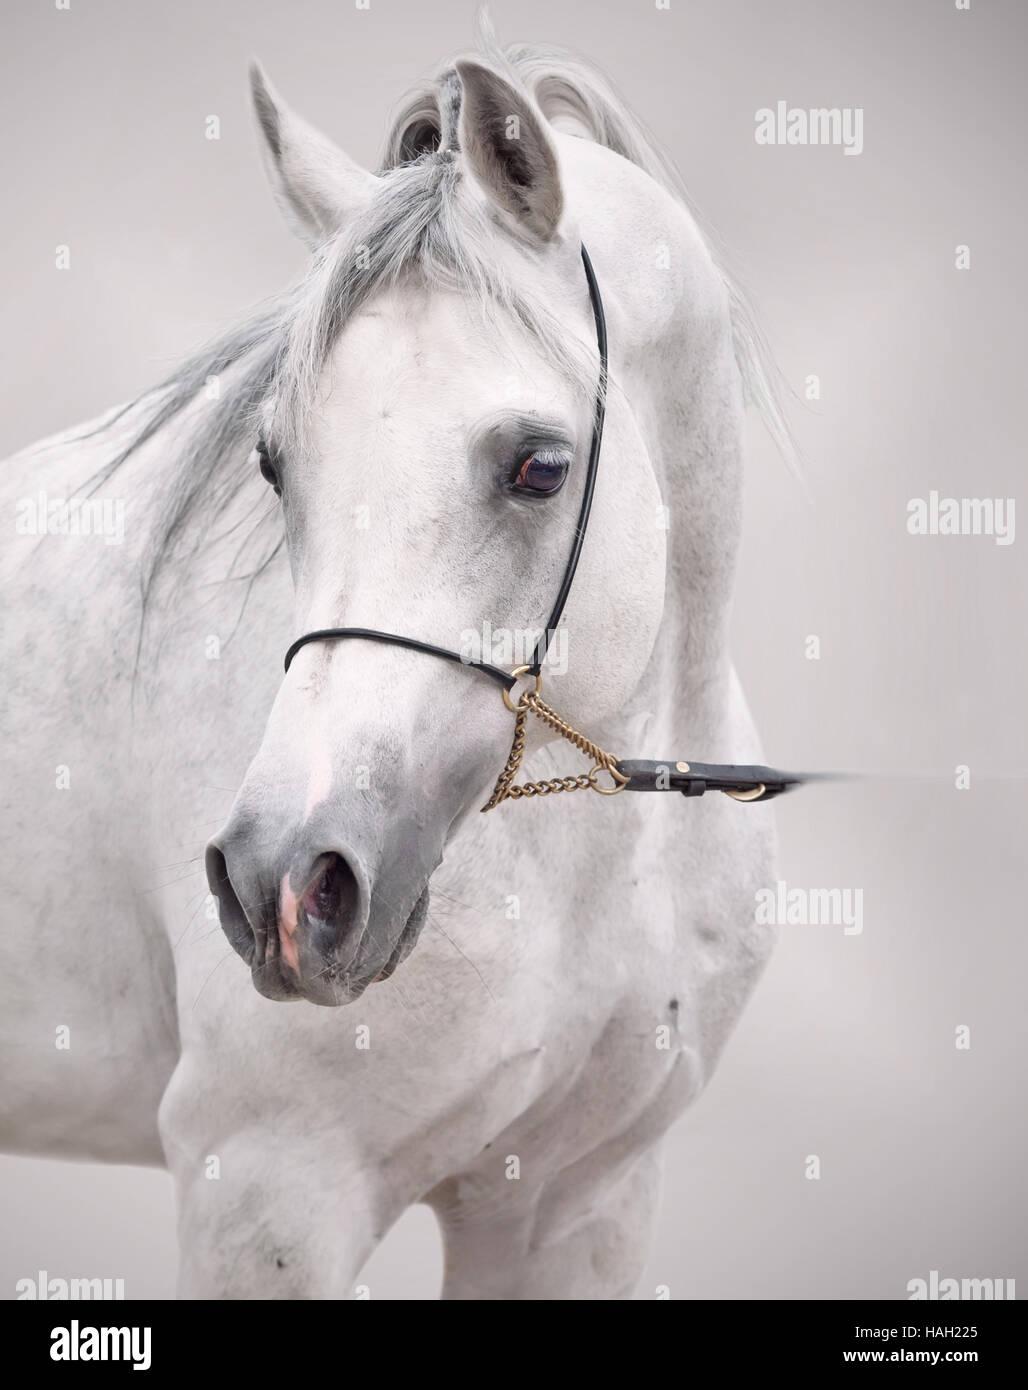 portrait of white arabian horse. at grey background - Stock Image